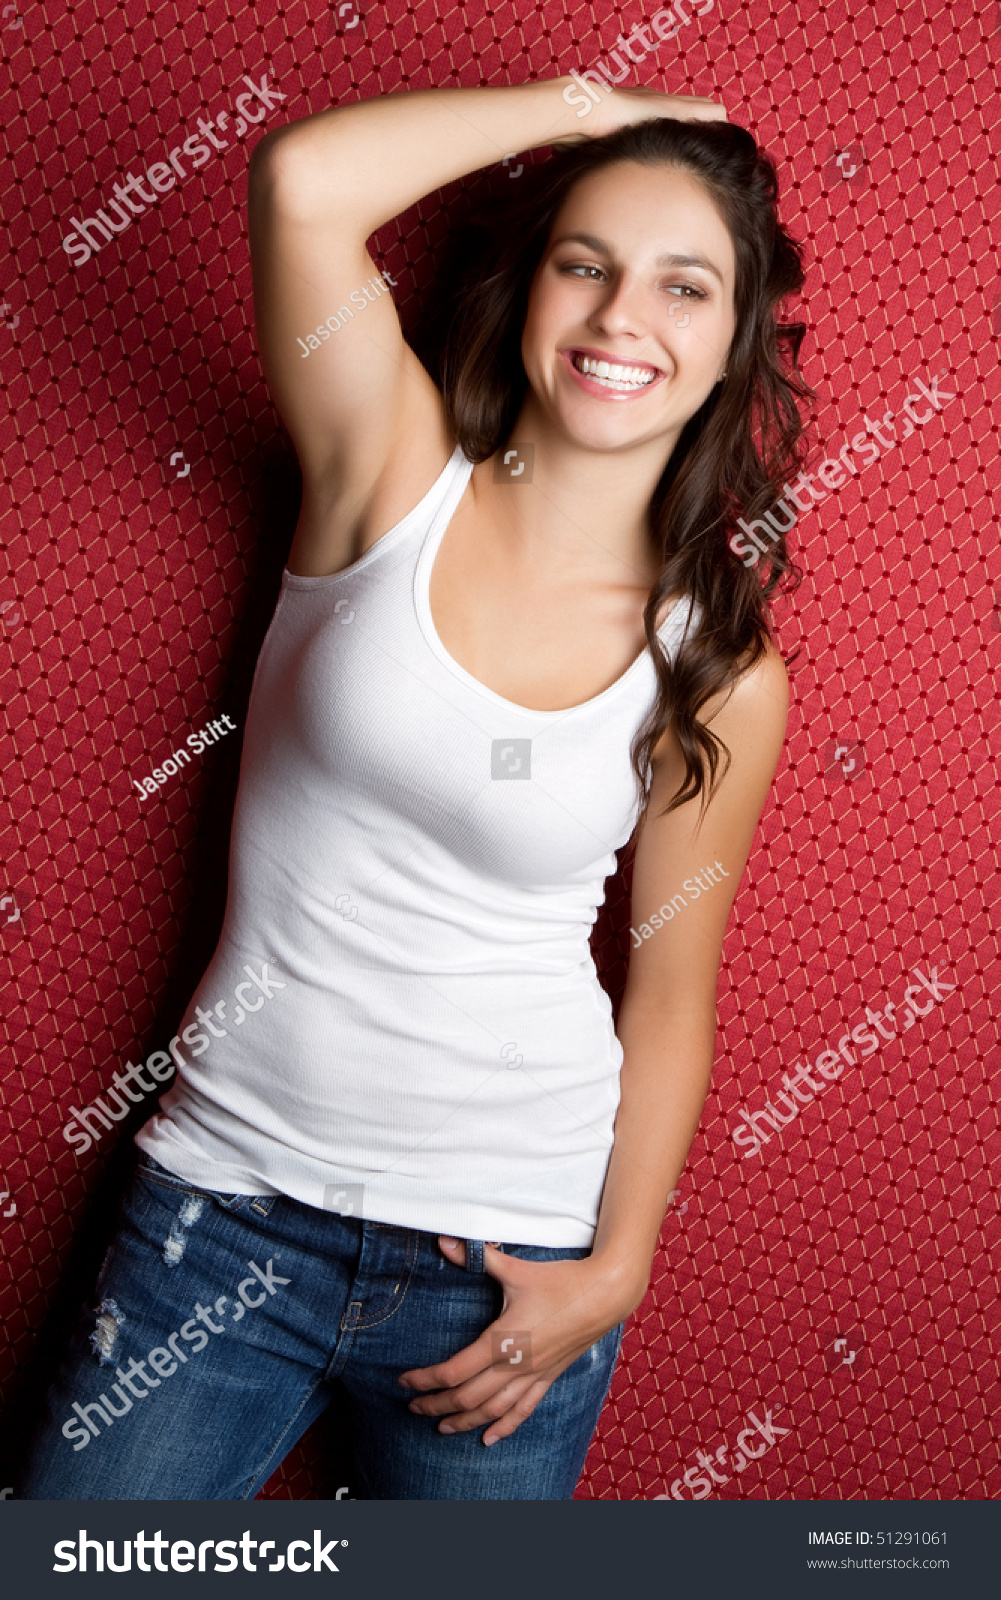 Happy Teen By Crumbling Wall Stock Image: Happy Teen Girl Stock Photo 51291061